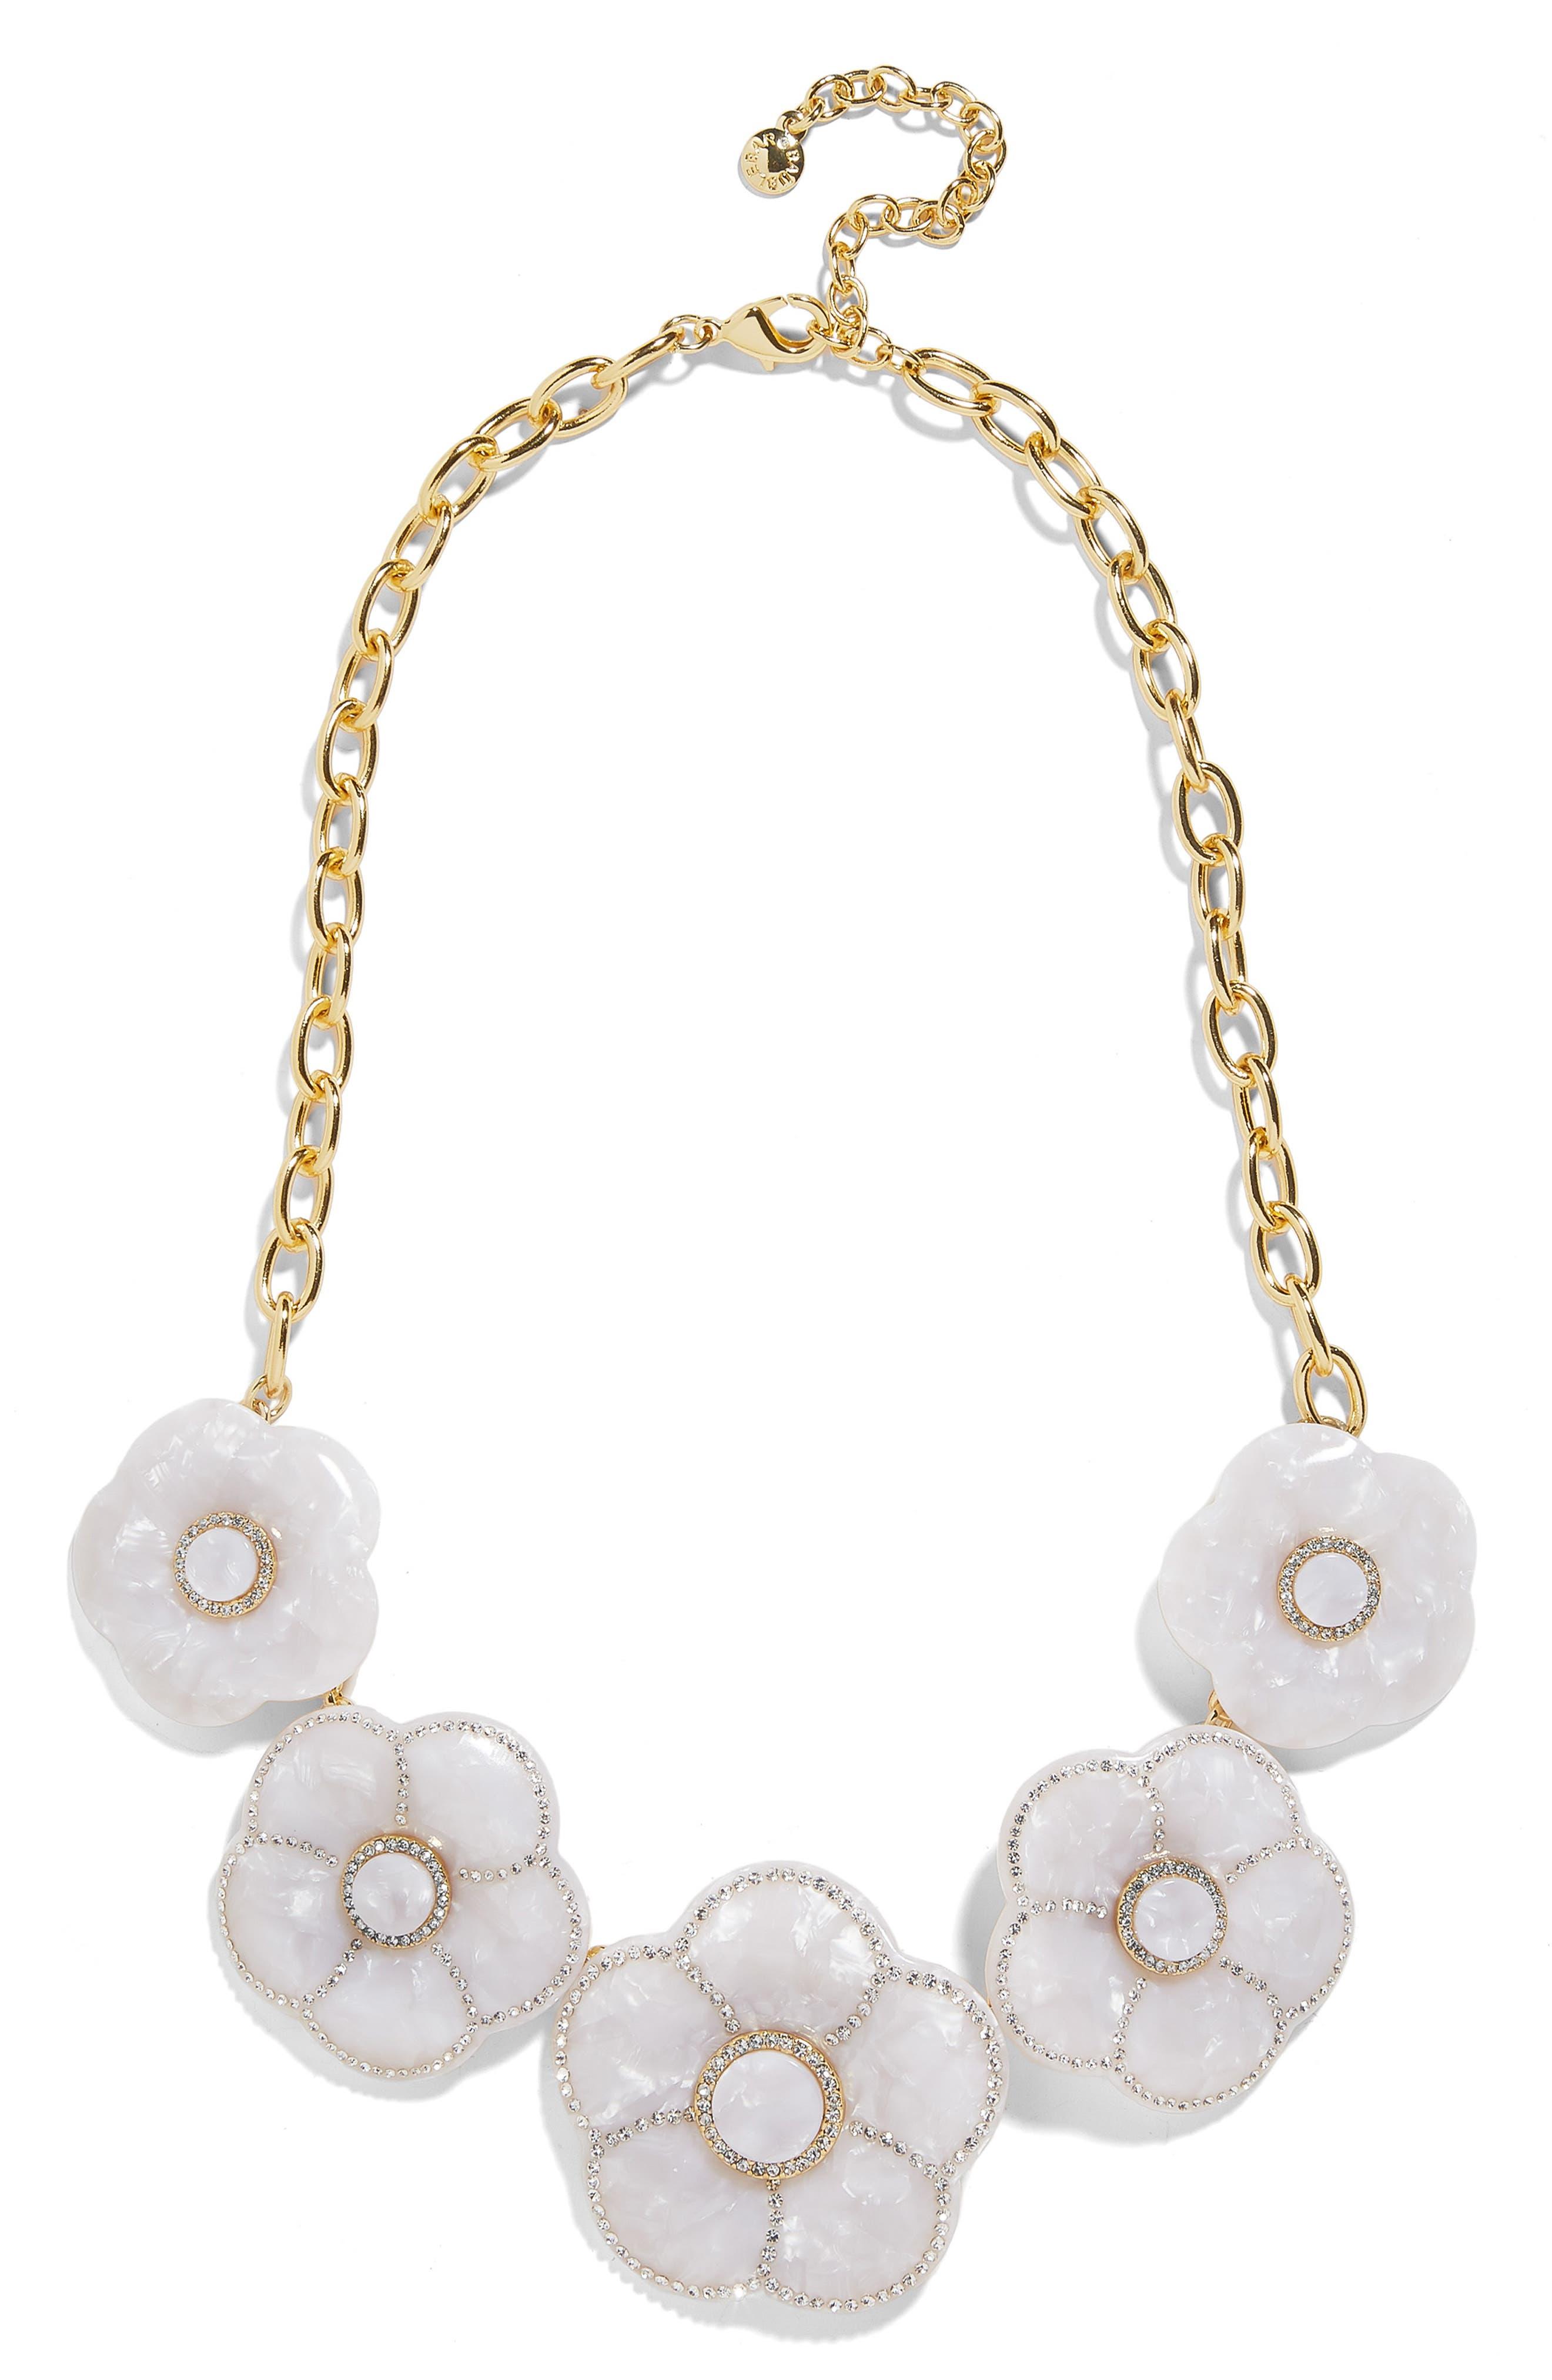 Madelaina Resin Flower Necklace,                             Main thumbnail 1, color,                             WHITE